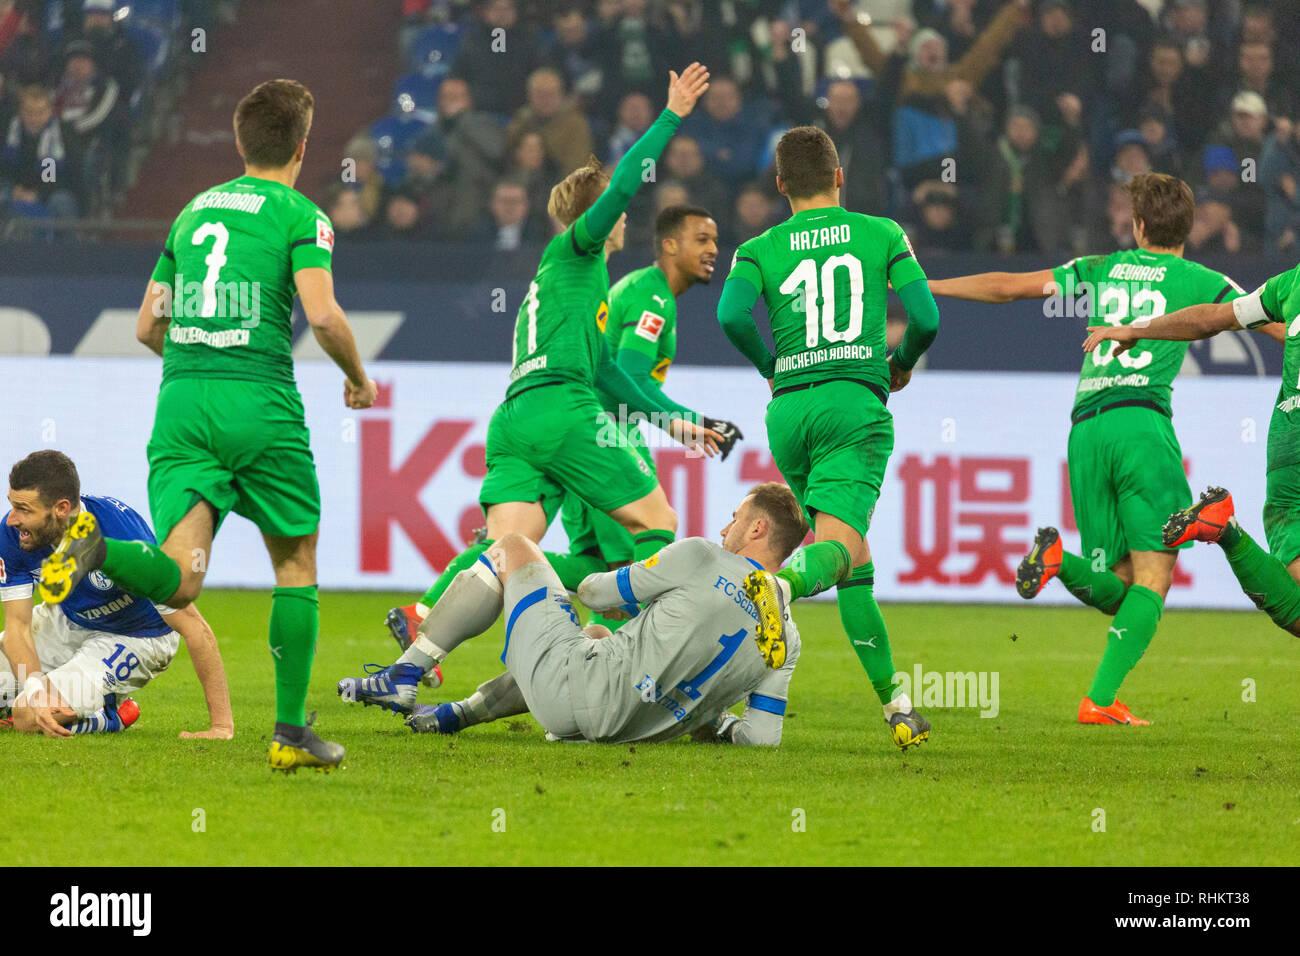 sports, football, Bundesliga, 2018/2019, FC Schalke 04 vs Borussia Moenchengladbach 0-2, Veltins Arena Gelsenkirchen, rejoicing at the 0-2 goal, f.l.t.r. Daniel Caligiuri (S04), Patrick Herrmann (MG), Oscar Wendt (MG), Alassane Plea (MG), goal keeper Ralf Faehrmann (S04), Thorgan Hazard (MG), goal scorer Florian Neuhaus (MG), DFL REGULATIONS PROHIBIT ANY USE OF PHOTOGRAPHS AS IMAGE SEQUENCES AND/OR QUASI-VIDEO - Stock Image